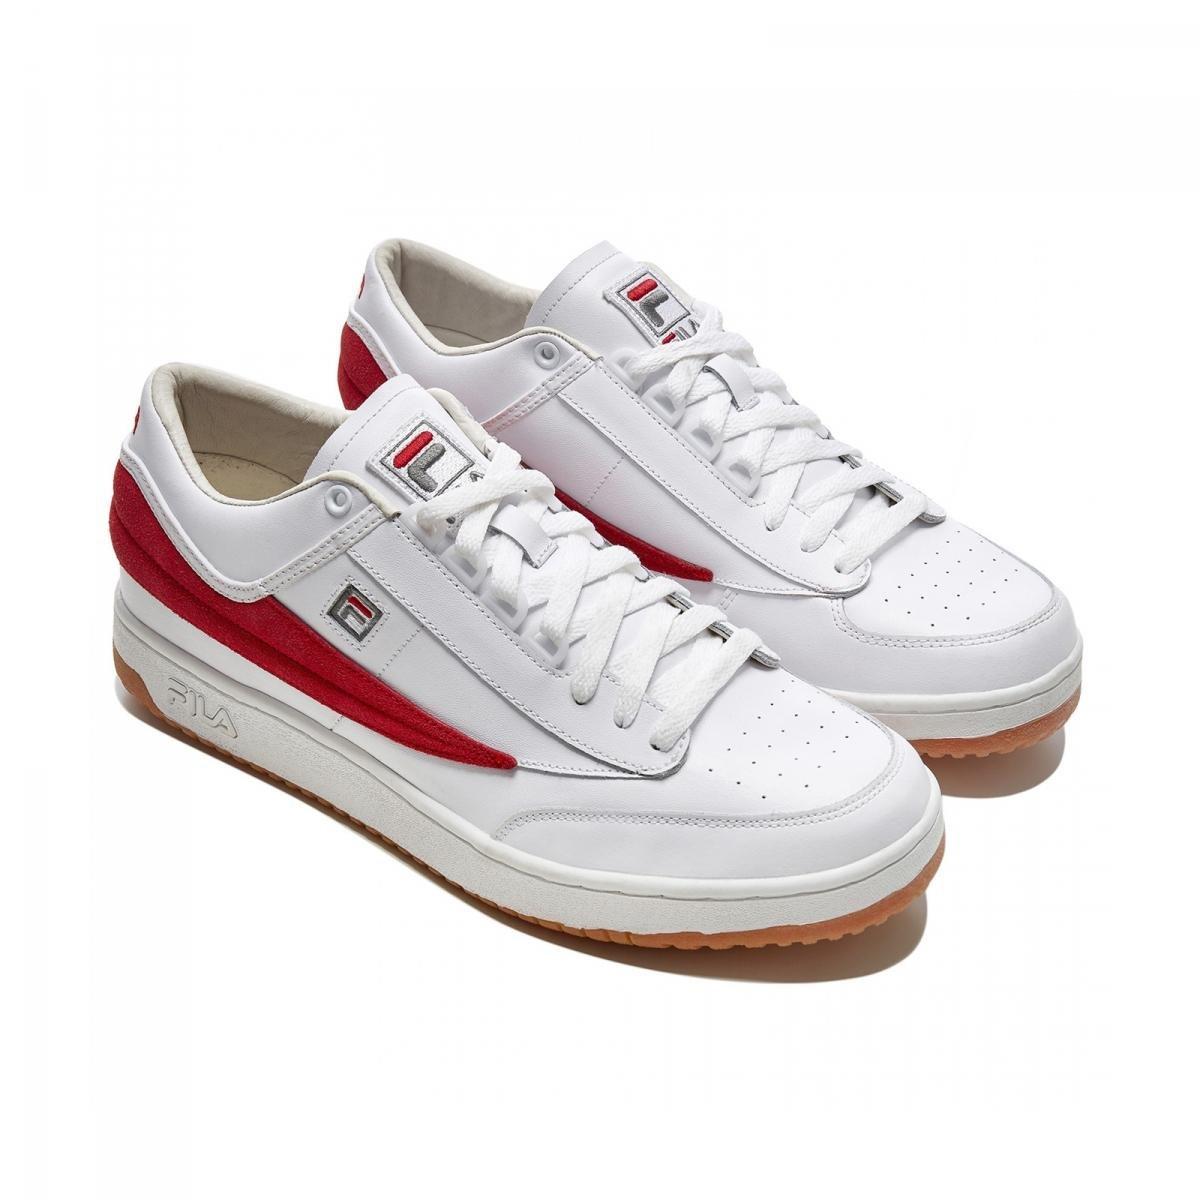 Gosha Rubchinskiy Fila T-1 Mid Sneakers in White